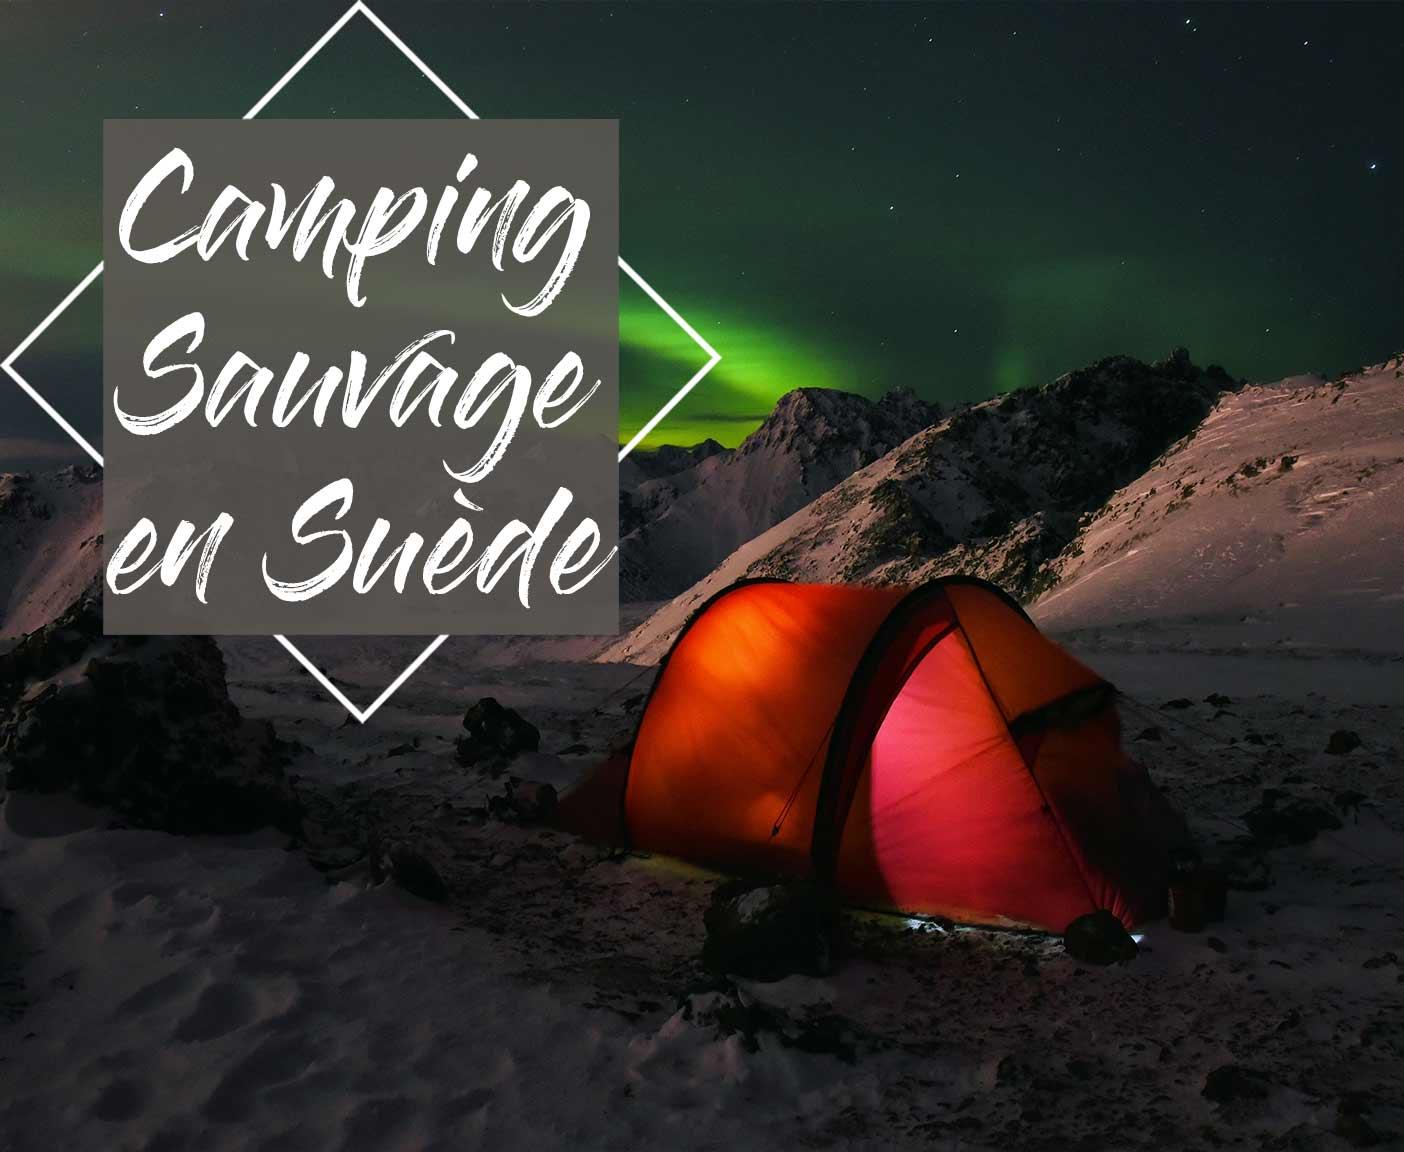 camping-sauvage-suede-europe-roadtrip-vanlife-regles